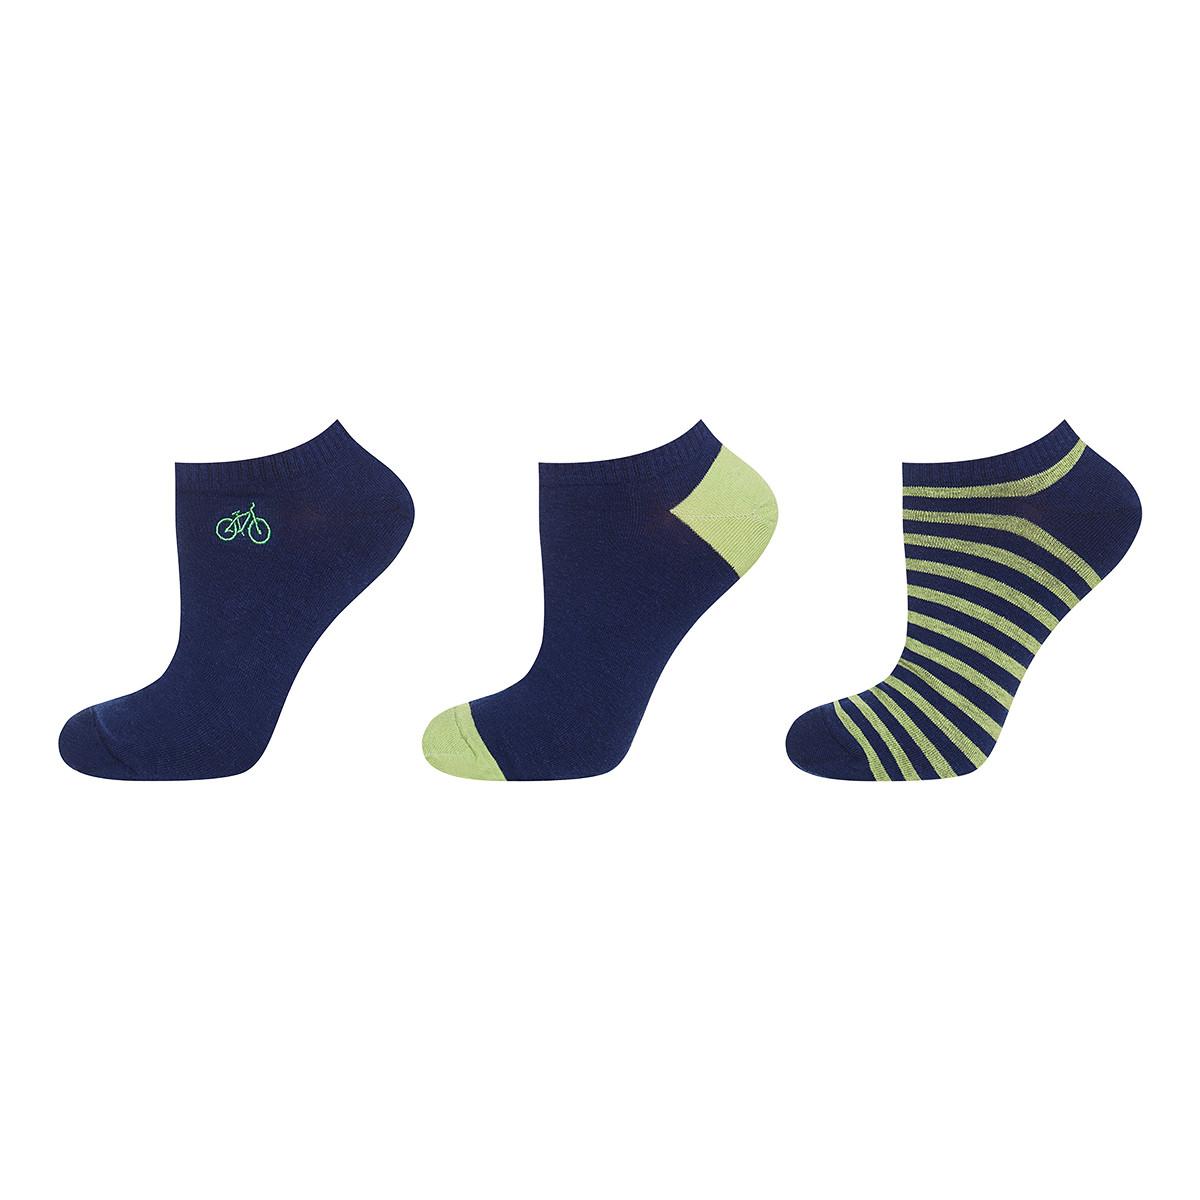 0c9547e676e8 Набор коротких мужских носков Soxo (3 пары)